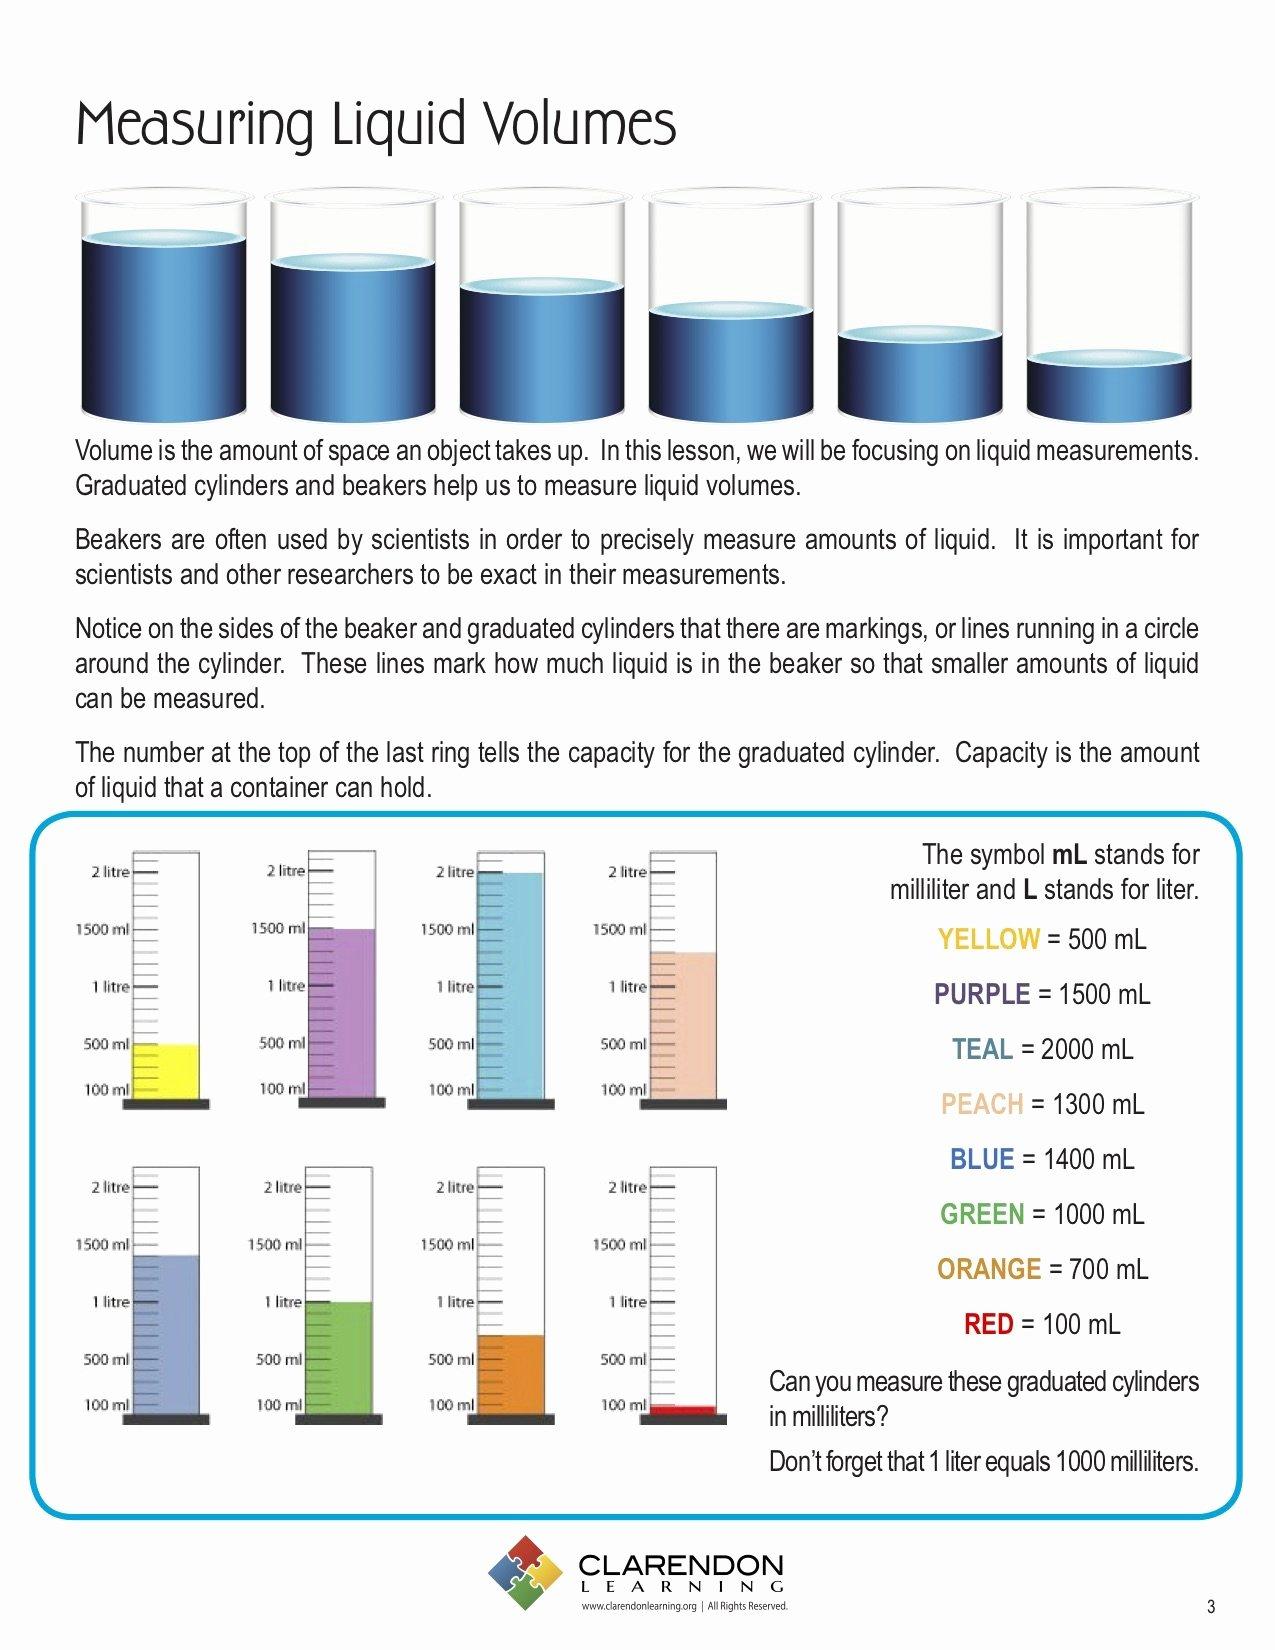 Measuring Liquid Volume Worksheet Answers Lovely Measuring Liquid Volume